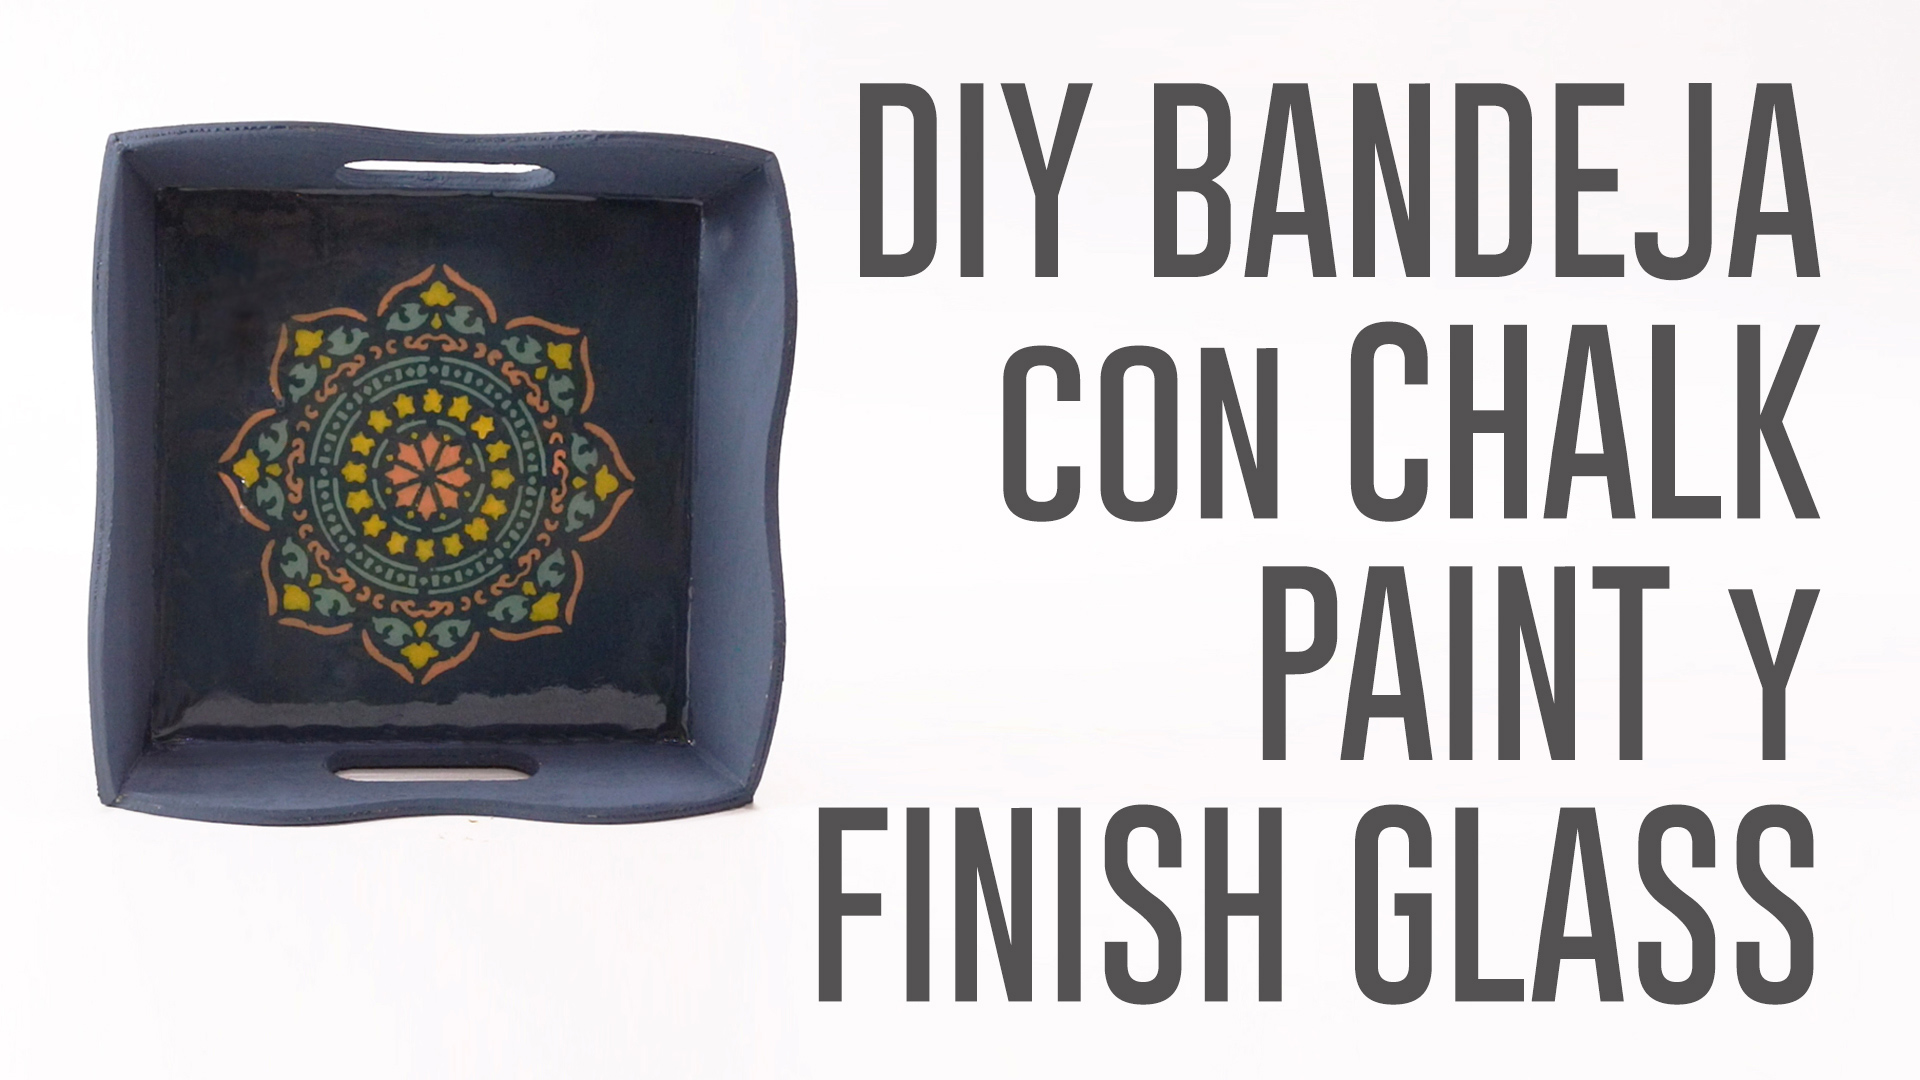 DIY BANDEJA CHALK PAINT FINISH GLASS.00_00_02_01.Imagen fija002